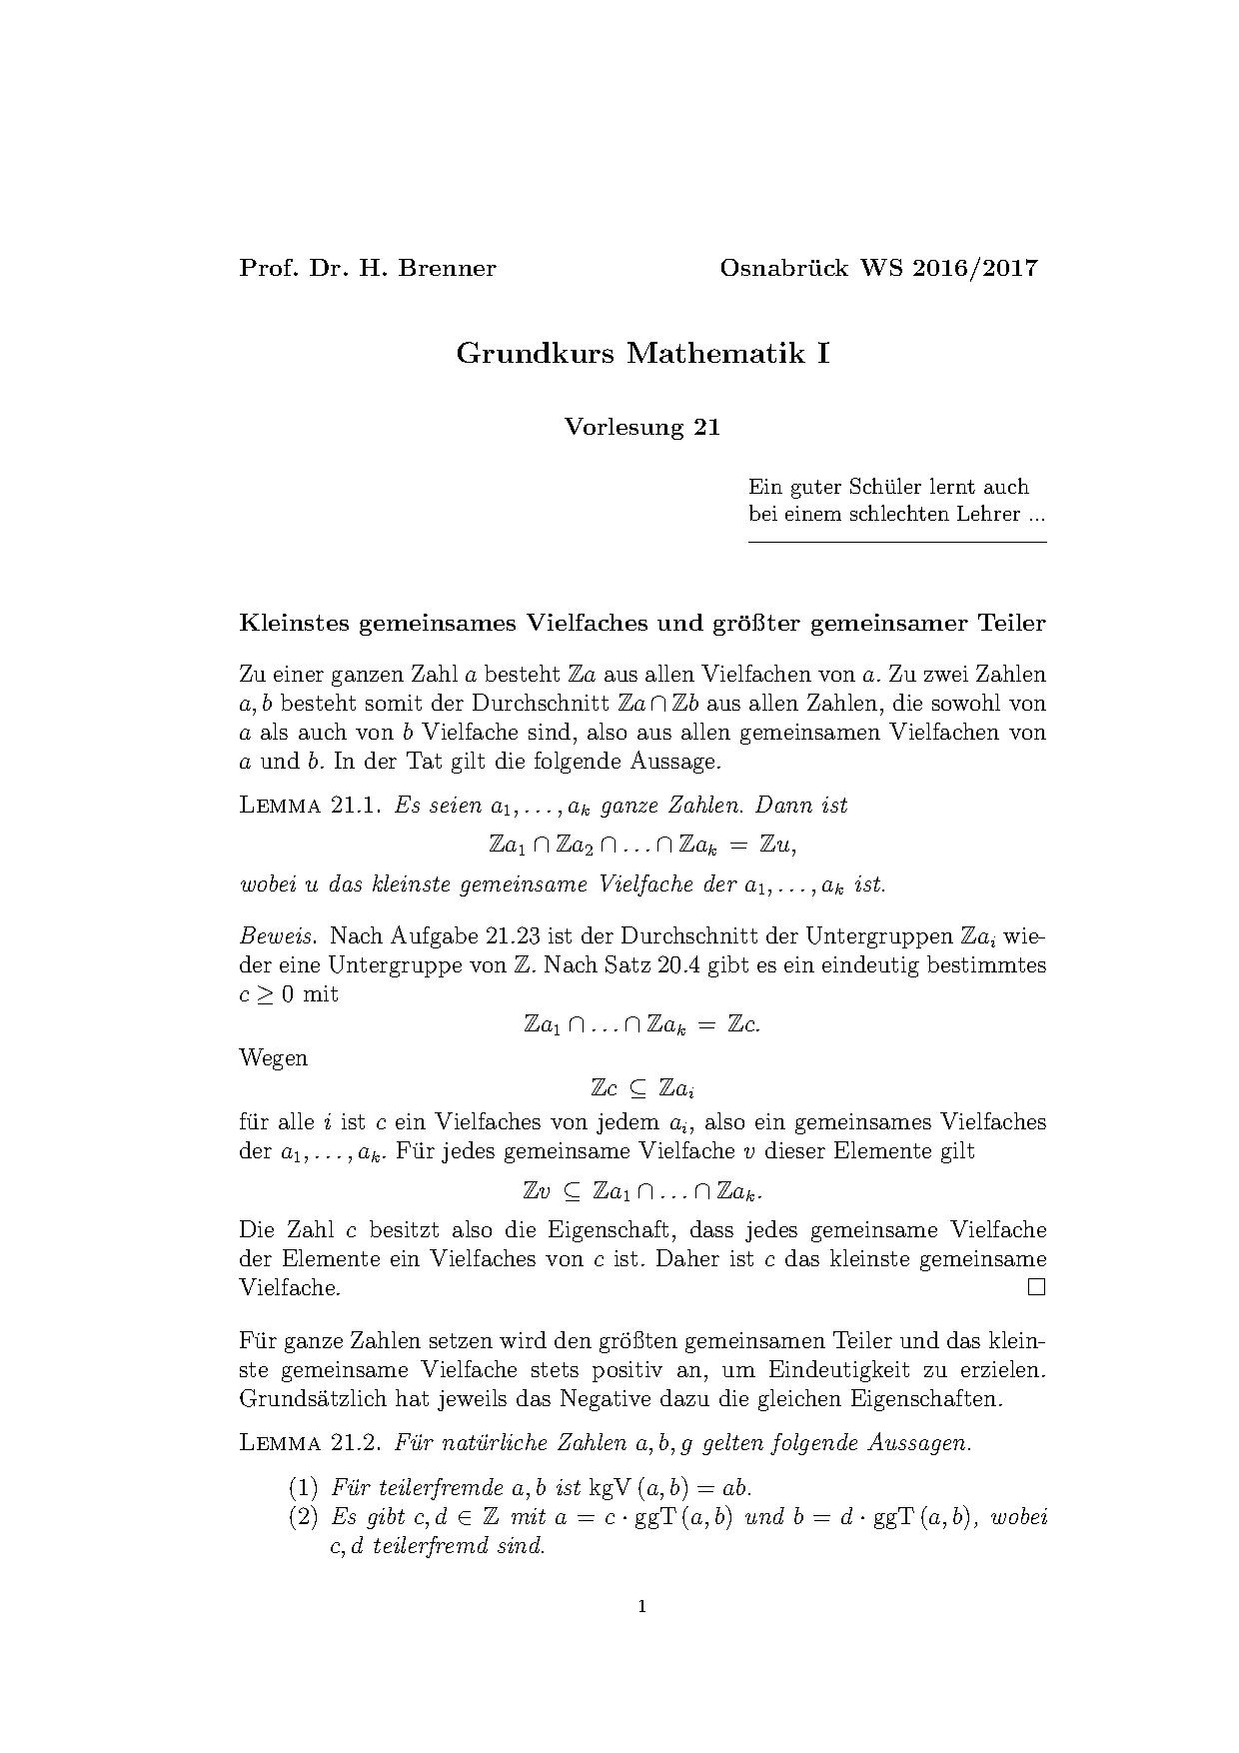 File:Grundkurs Mathematik (Osnabrück 2016-2017)Teil IVorlesung21.pdf ...